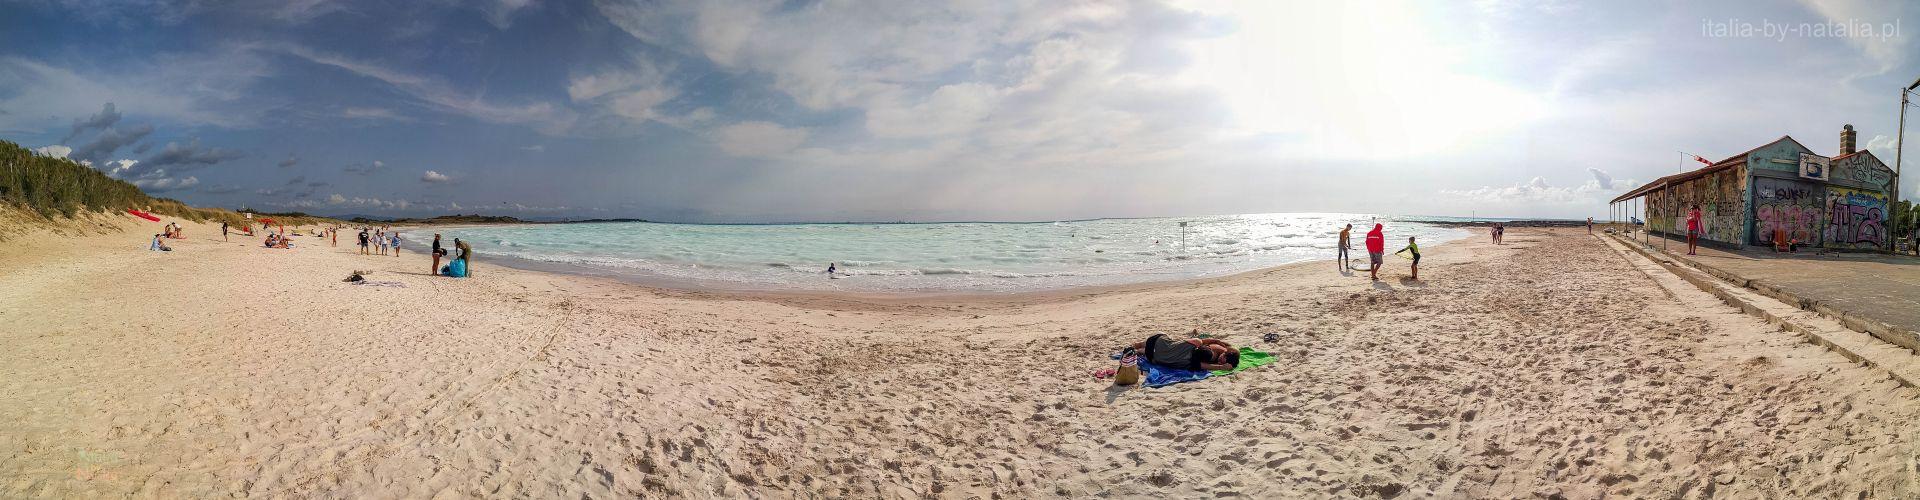 białe plaże Toskania Rosignano Solvay Vada biała plaża Toskania